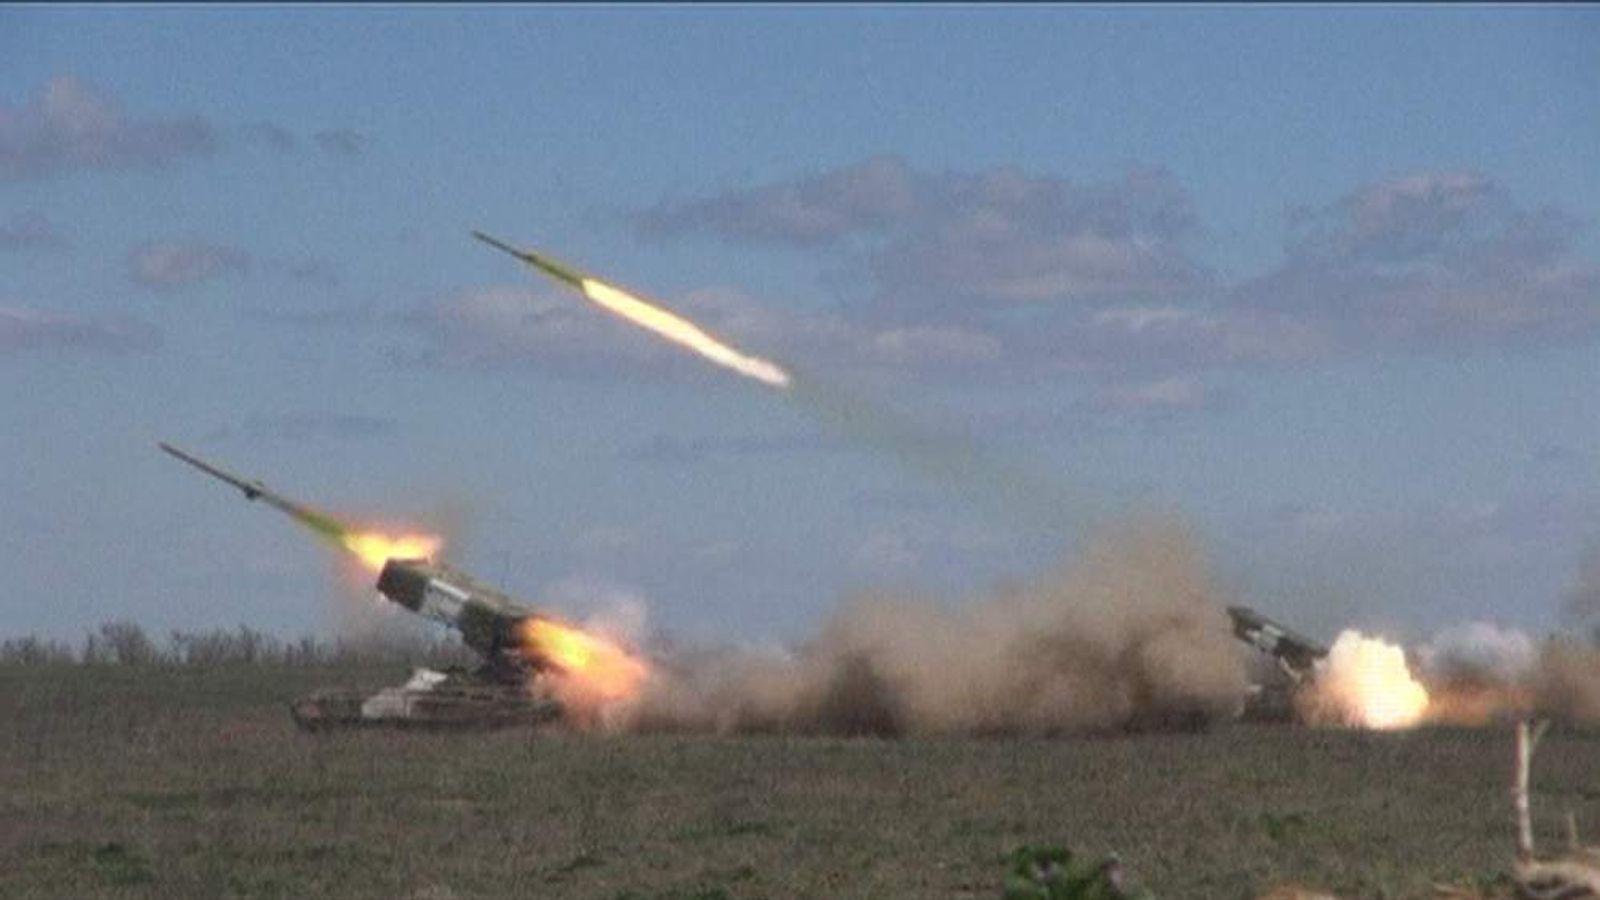 Russian rocket launchers operating close to Ukraine's border